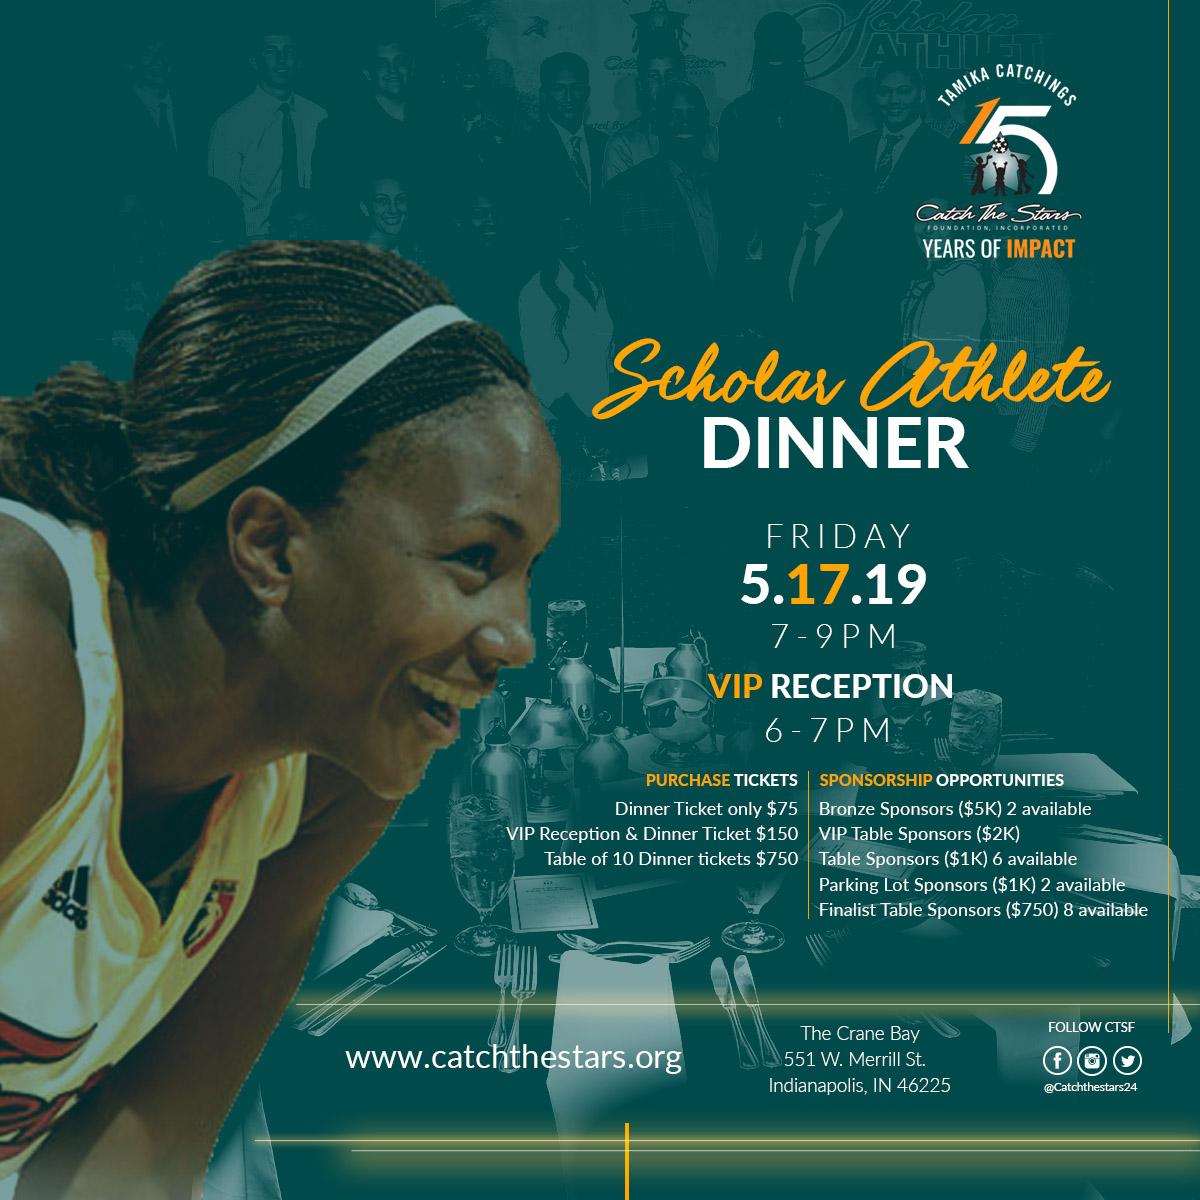 Scholar Athlete Dinner